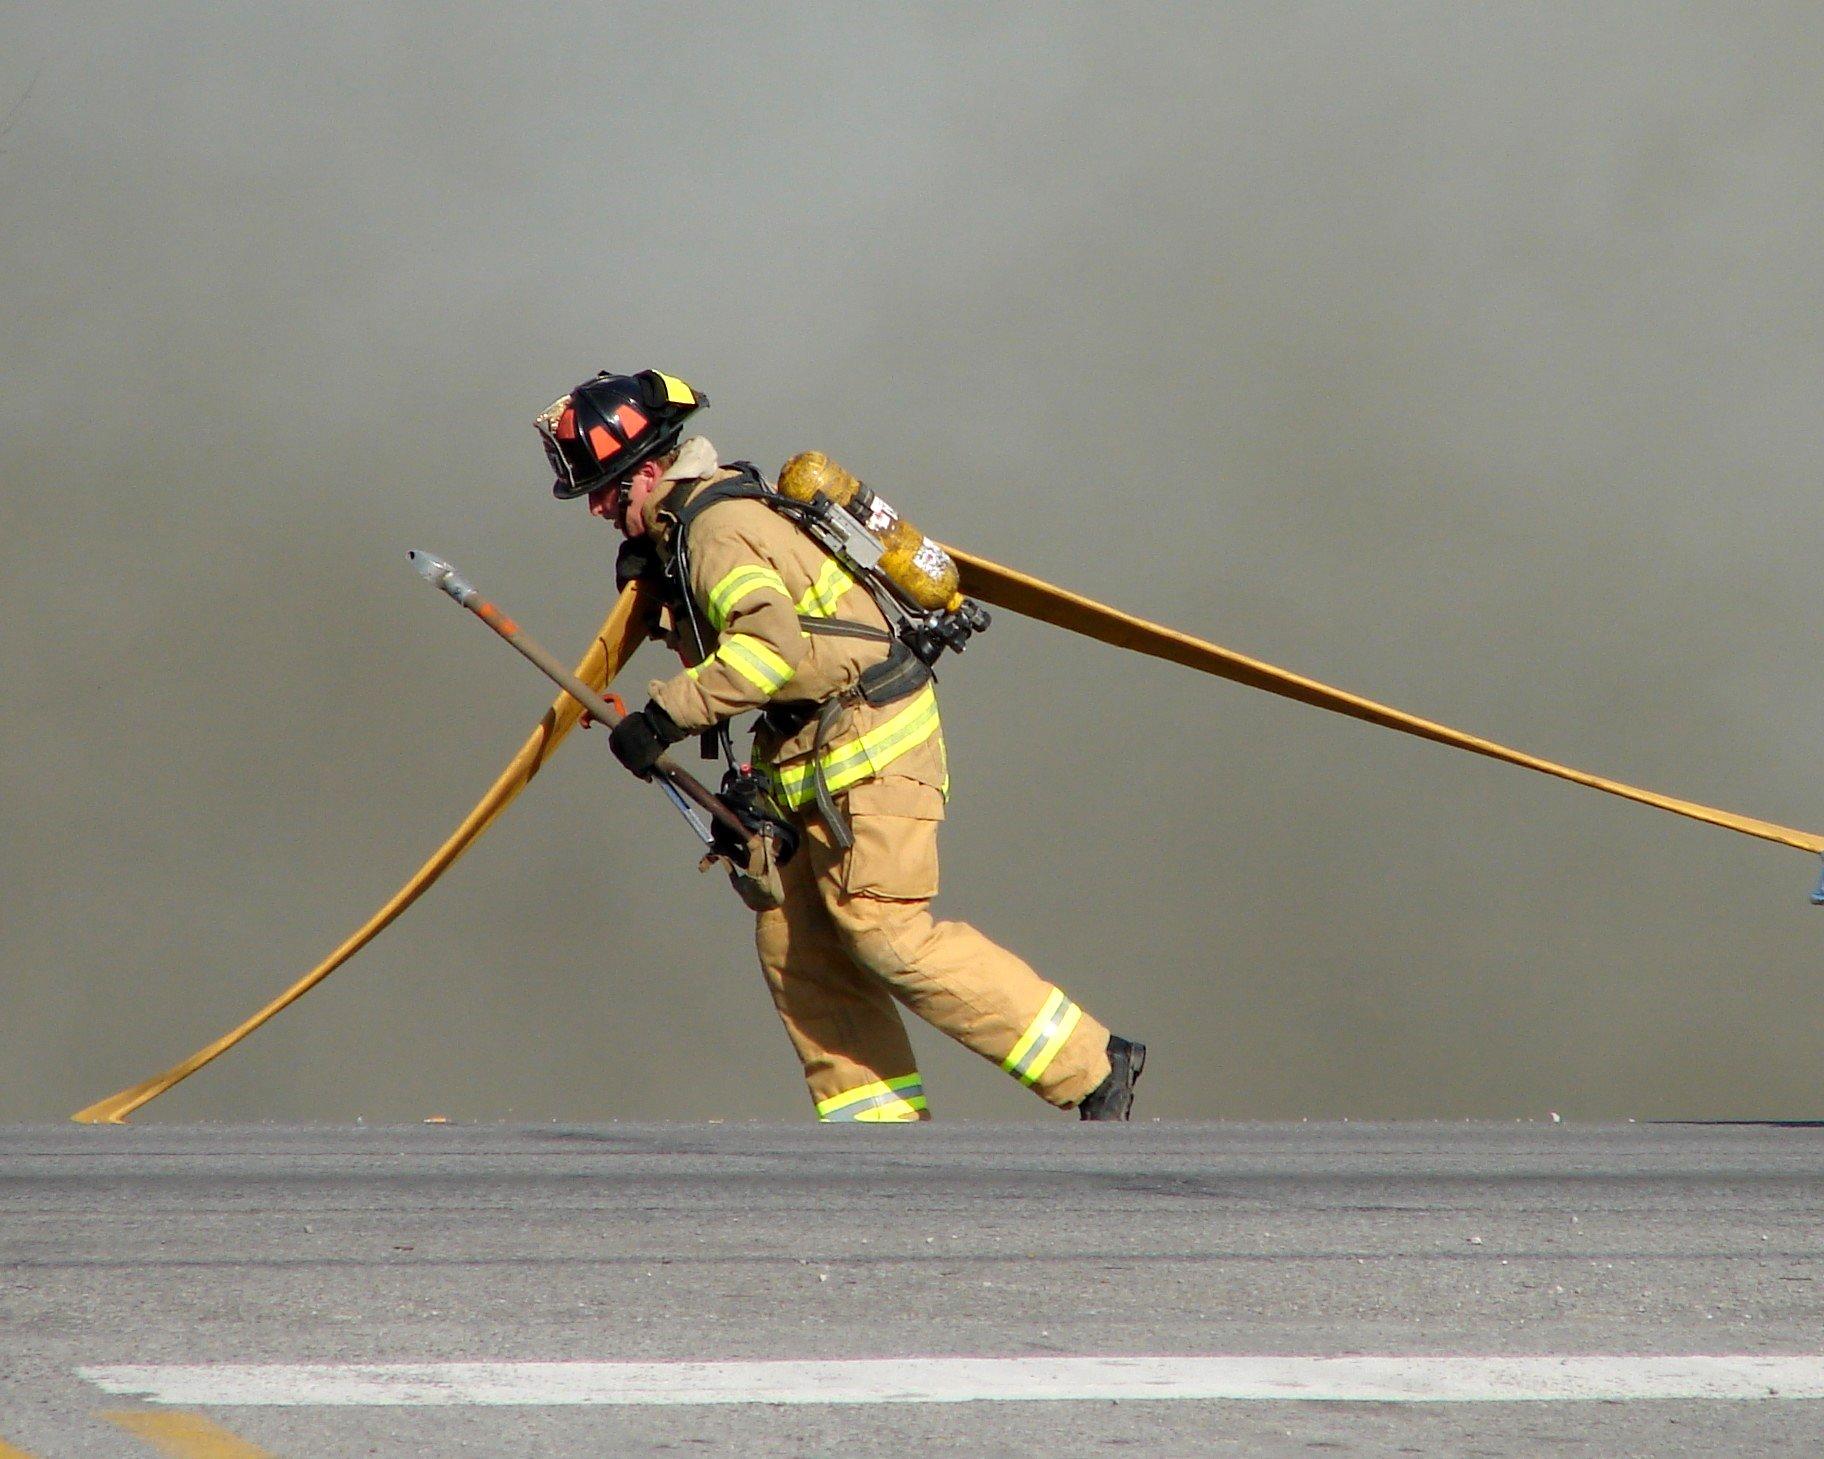 Wallpaper Smoke Helmet Fire Hero Uniform Hose